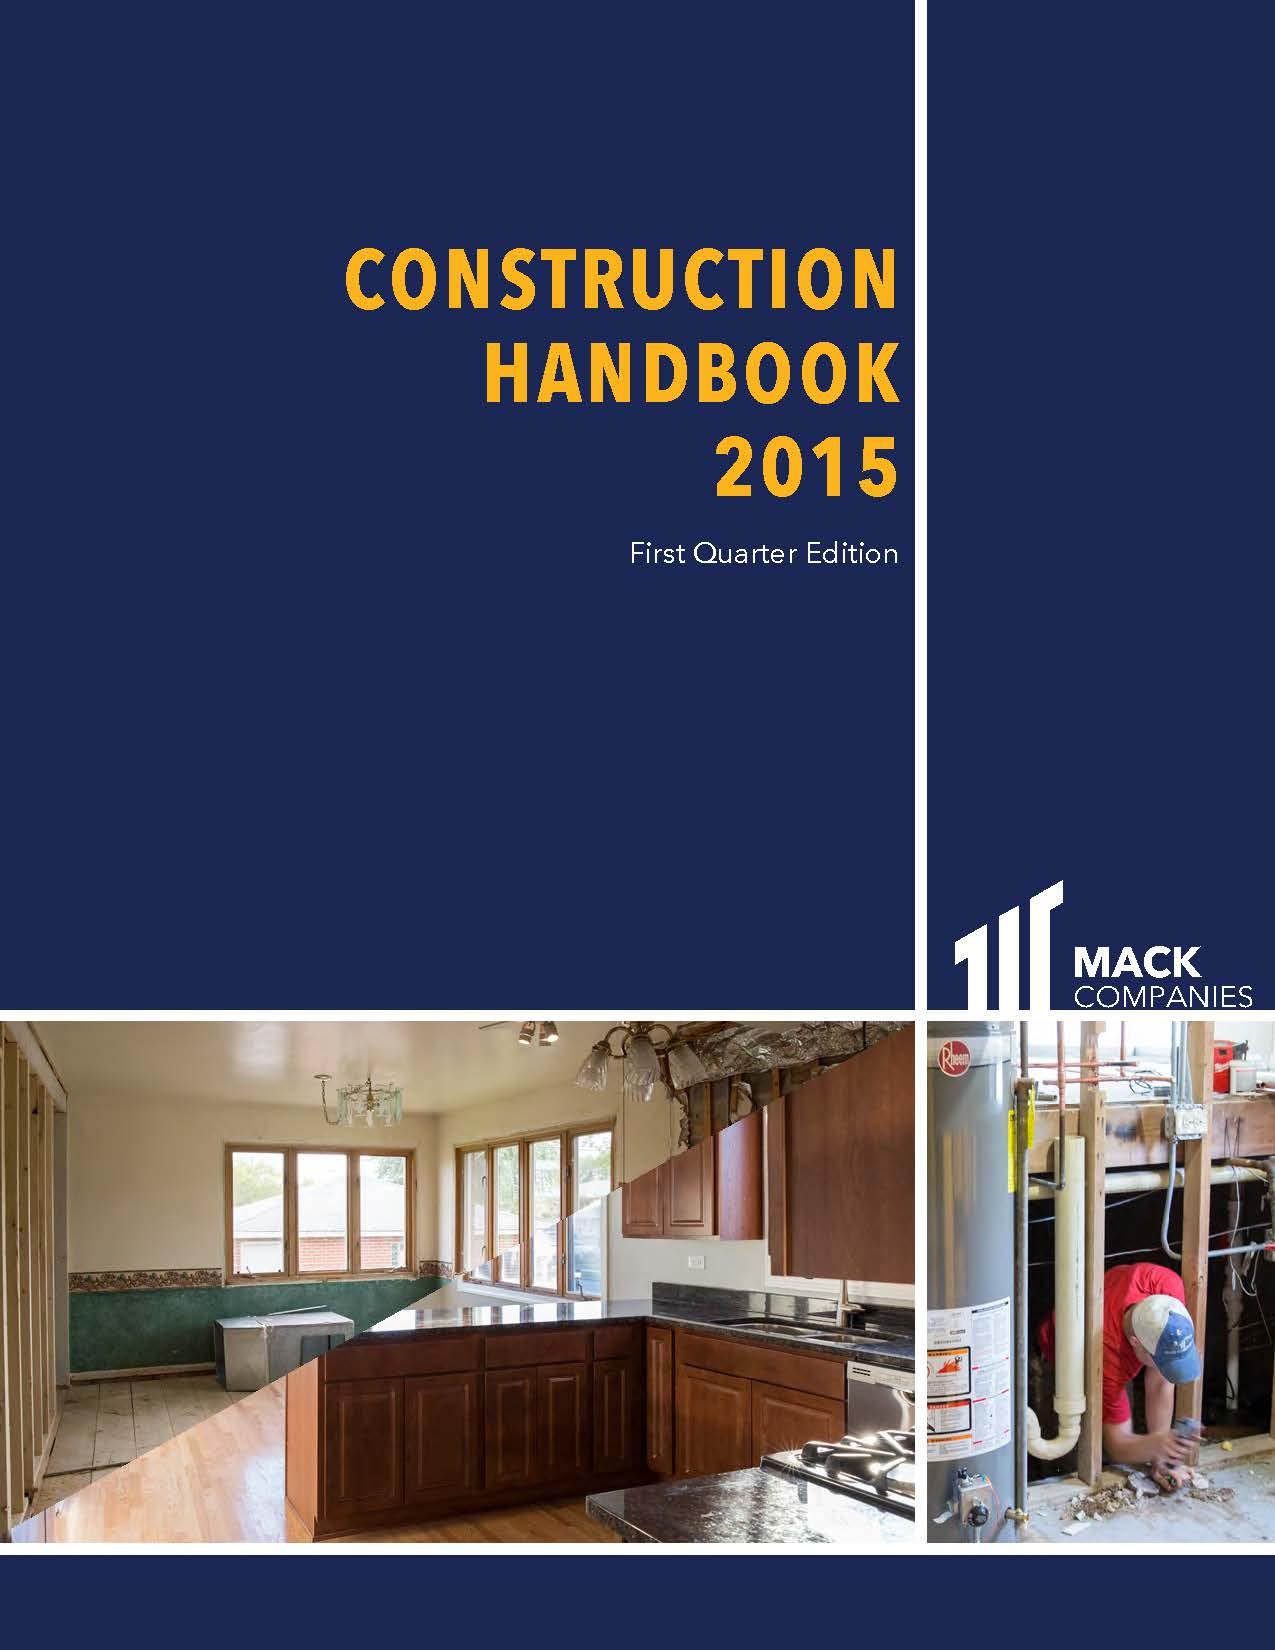 20150429_MACKCompanies_Construction_Handbook_smaller_Page_01.jpg